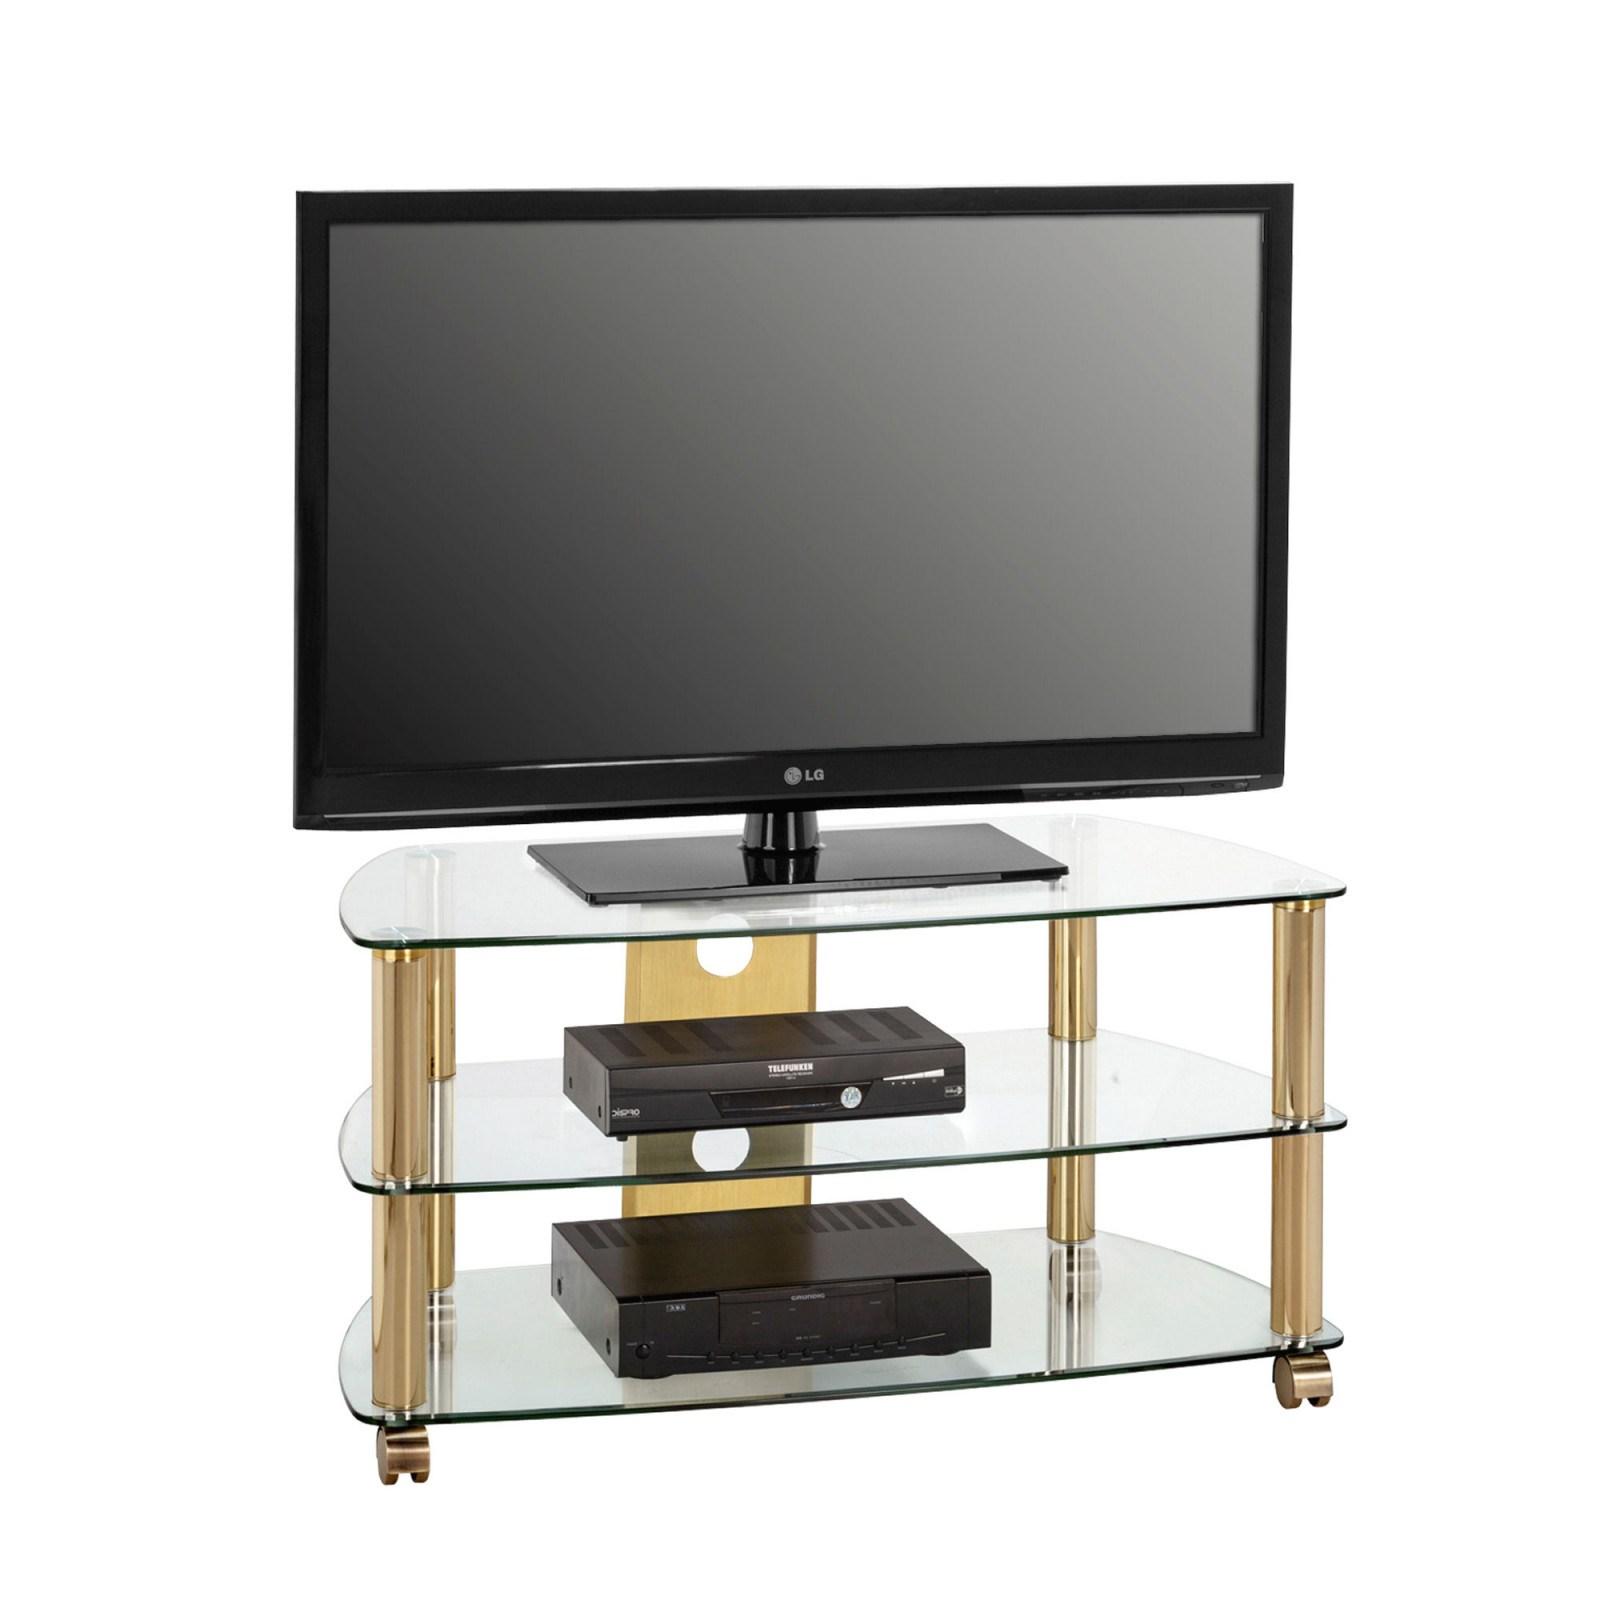 Lg meuble tv